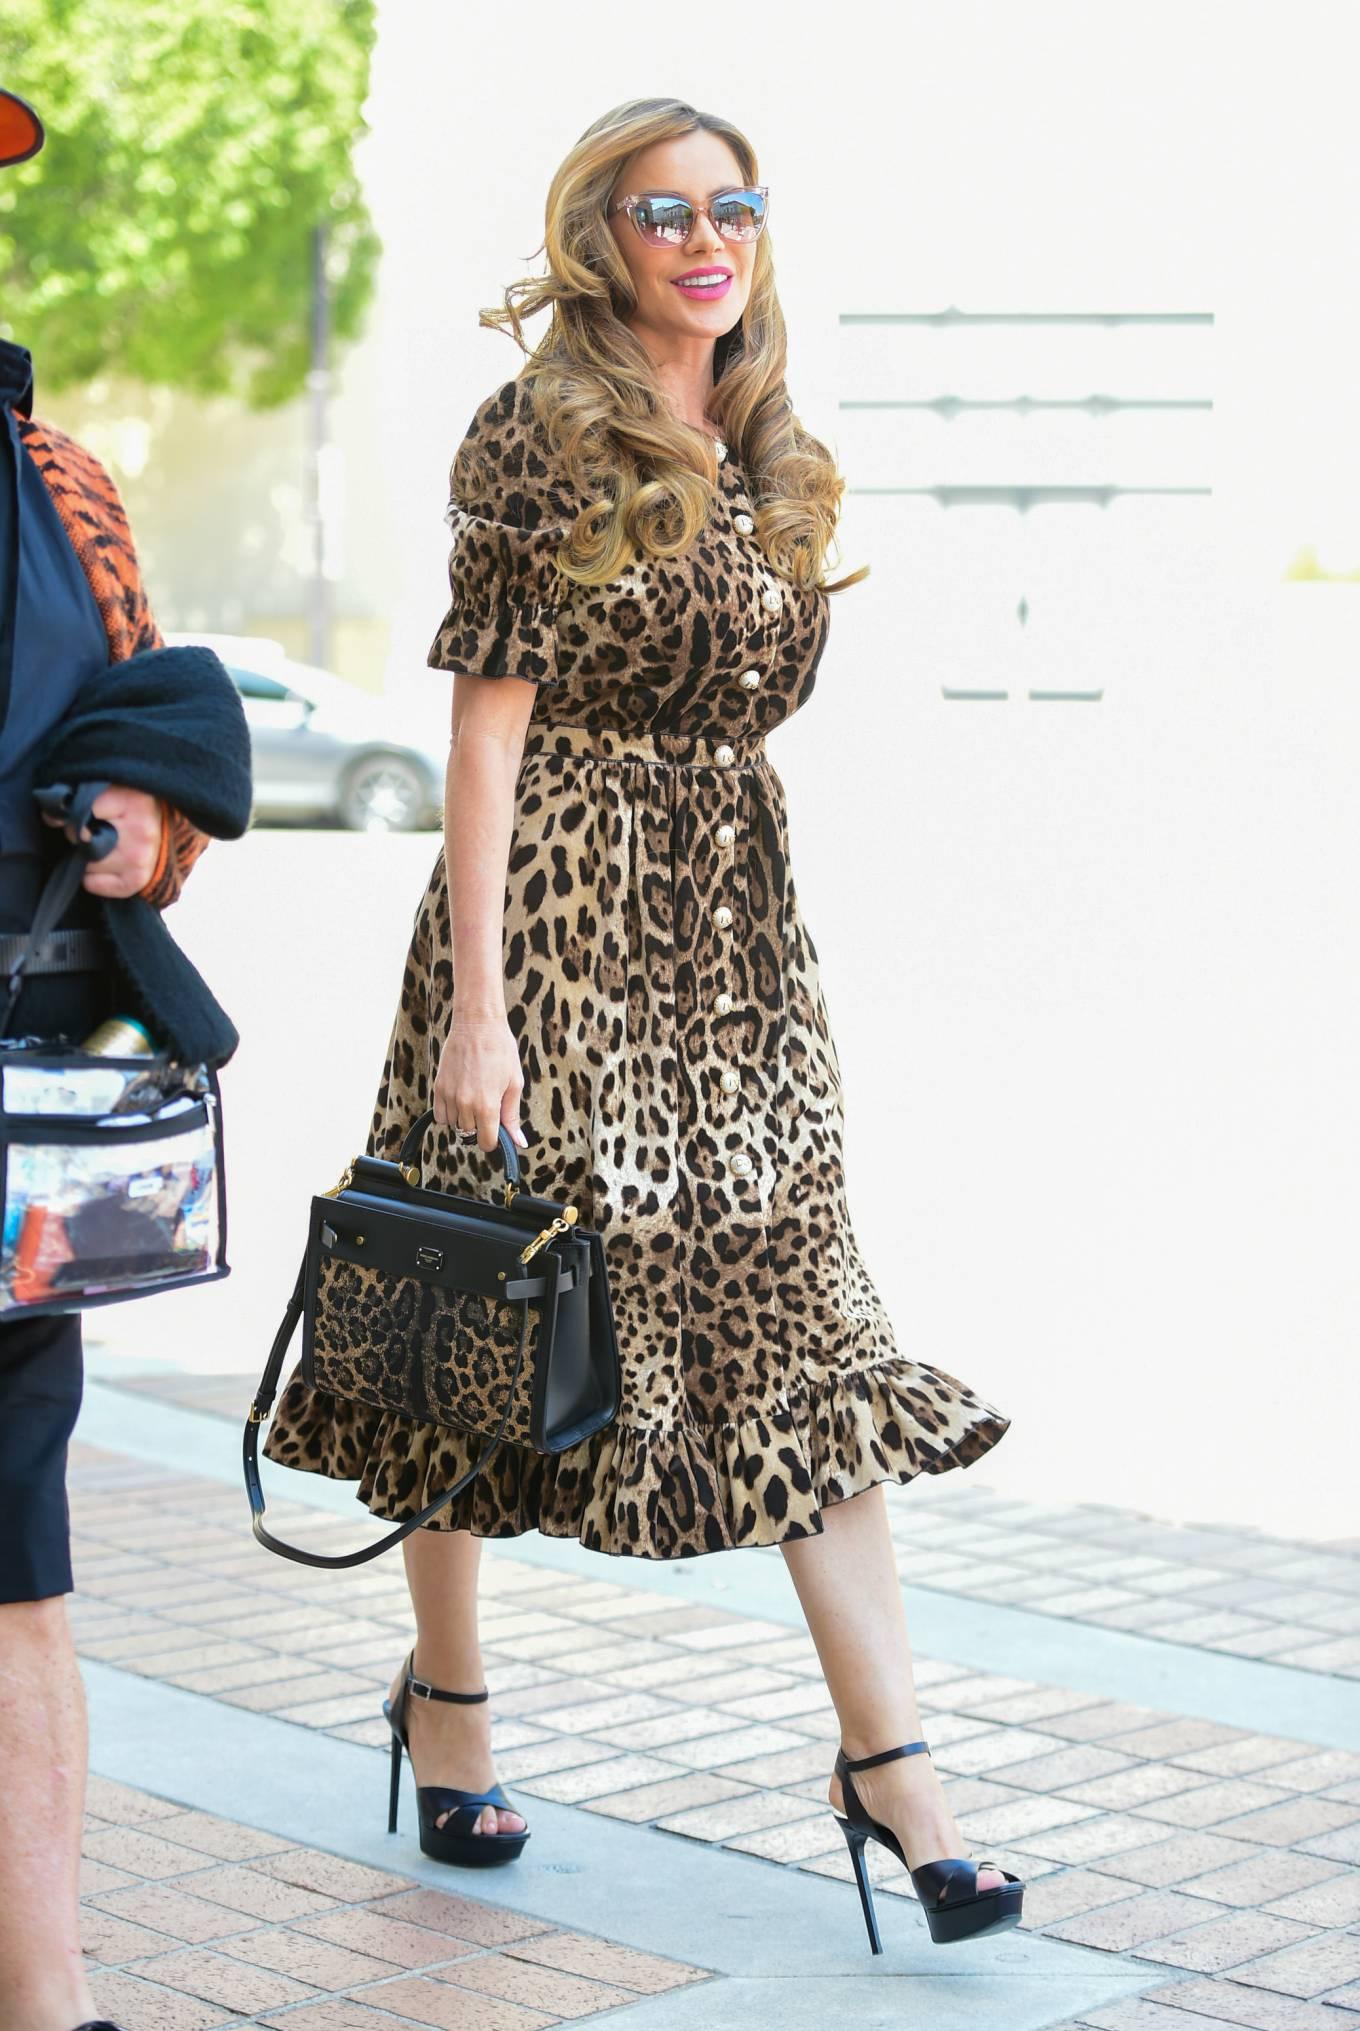 Sofia Vergara - In leopard print dress in Los Angeles